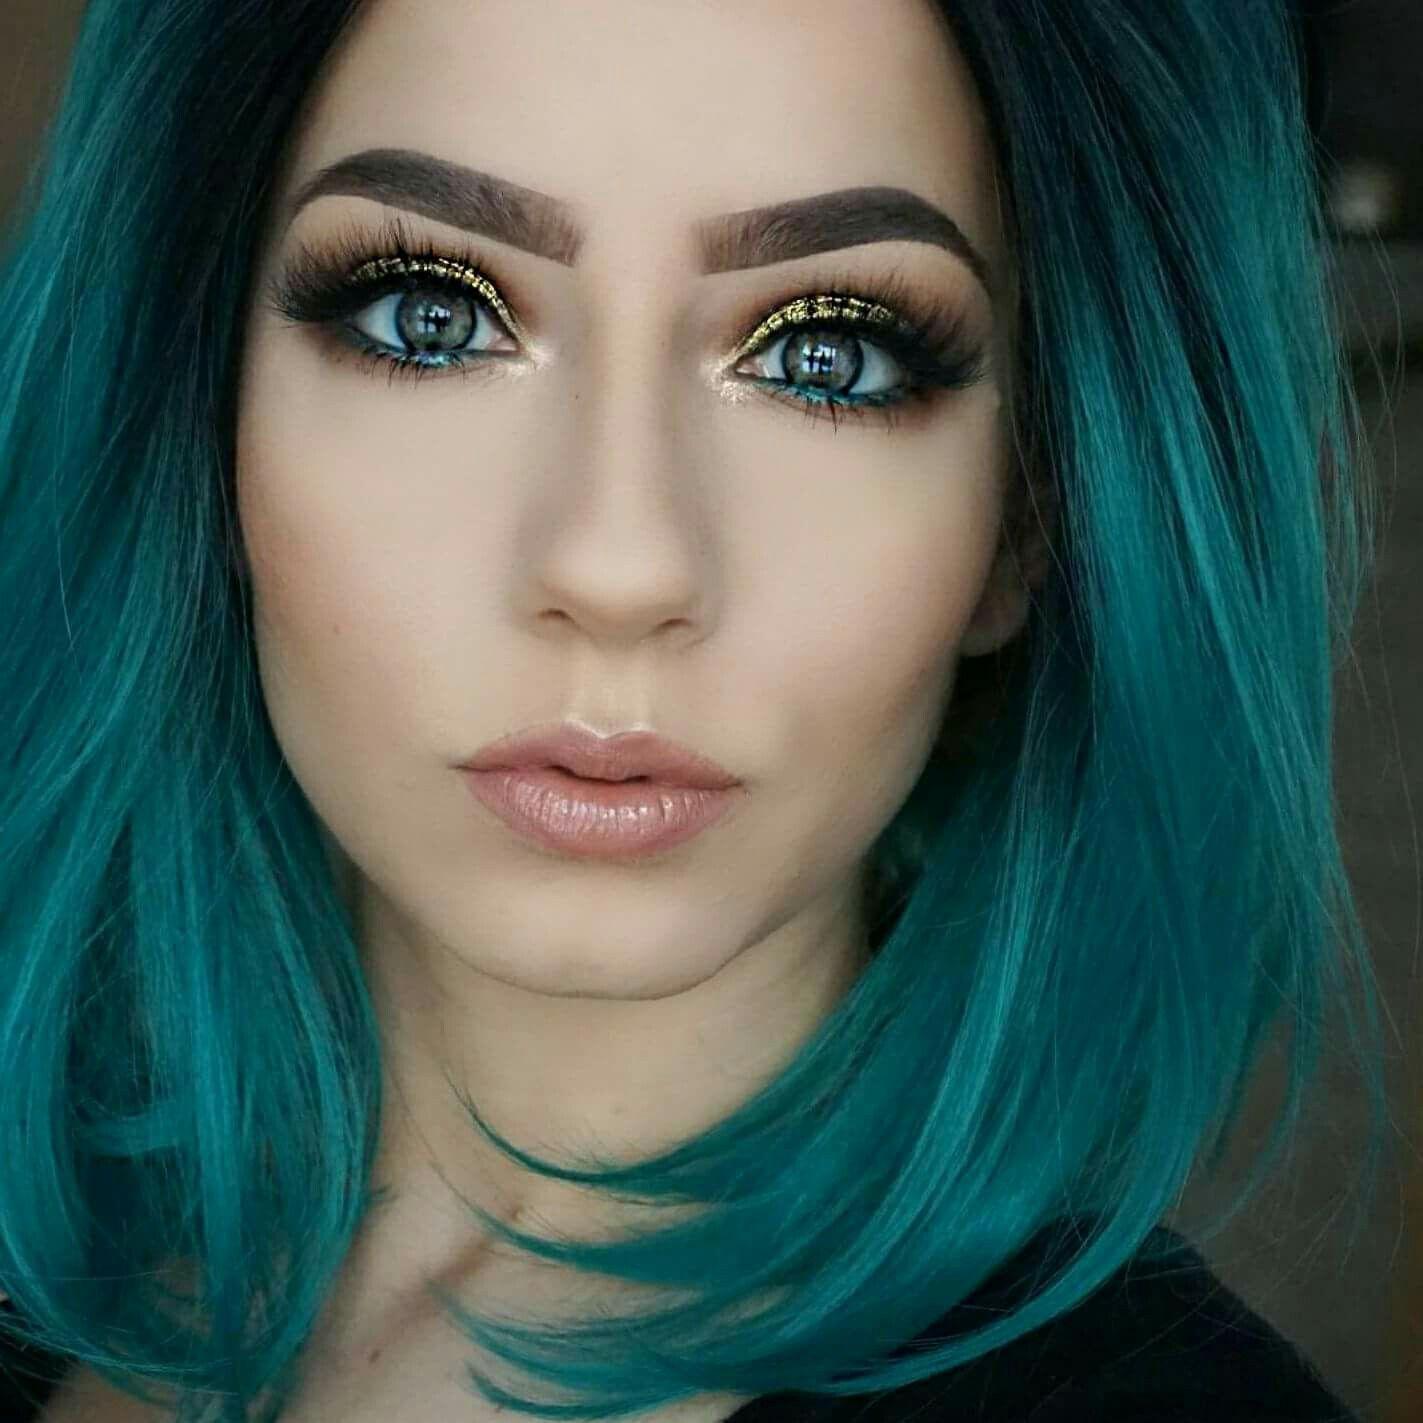 Krystal Clear Makeup Hair Color For Fair Skin Krystal Clear Makeup Hair Color